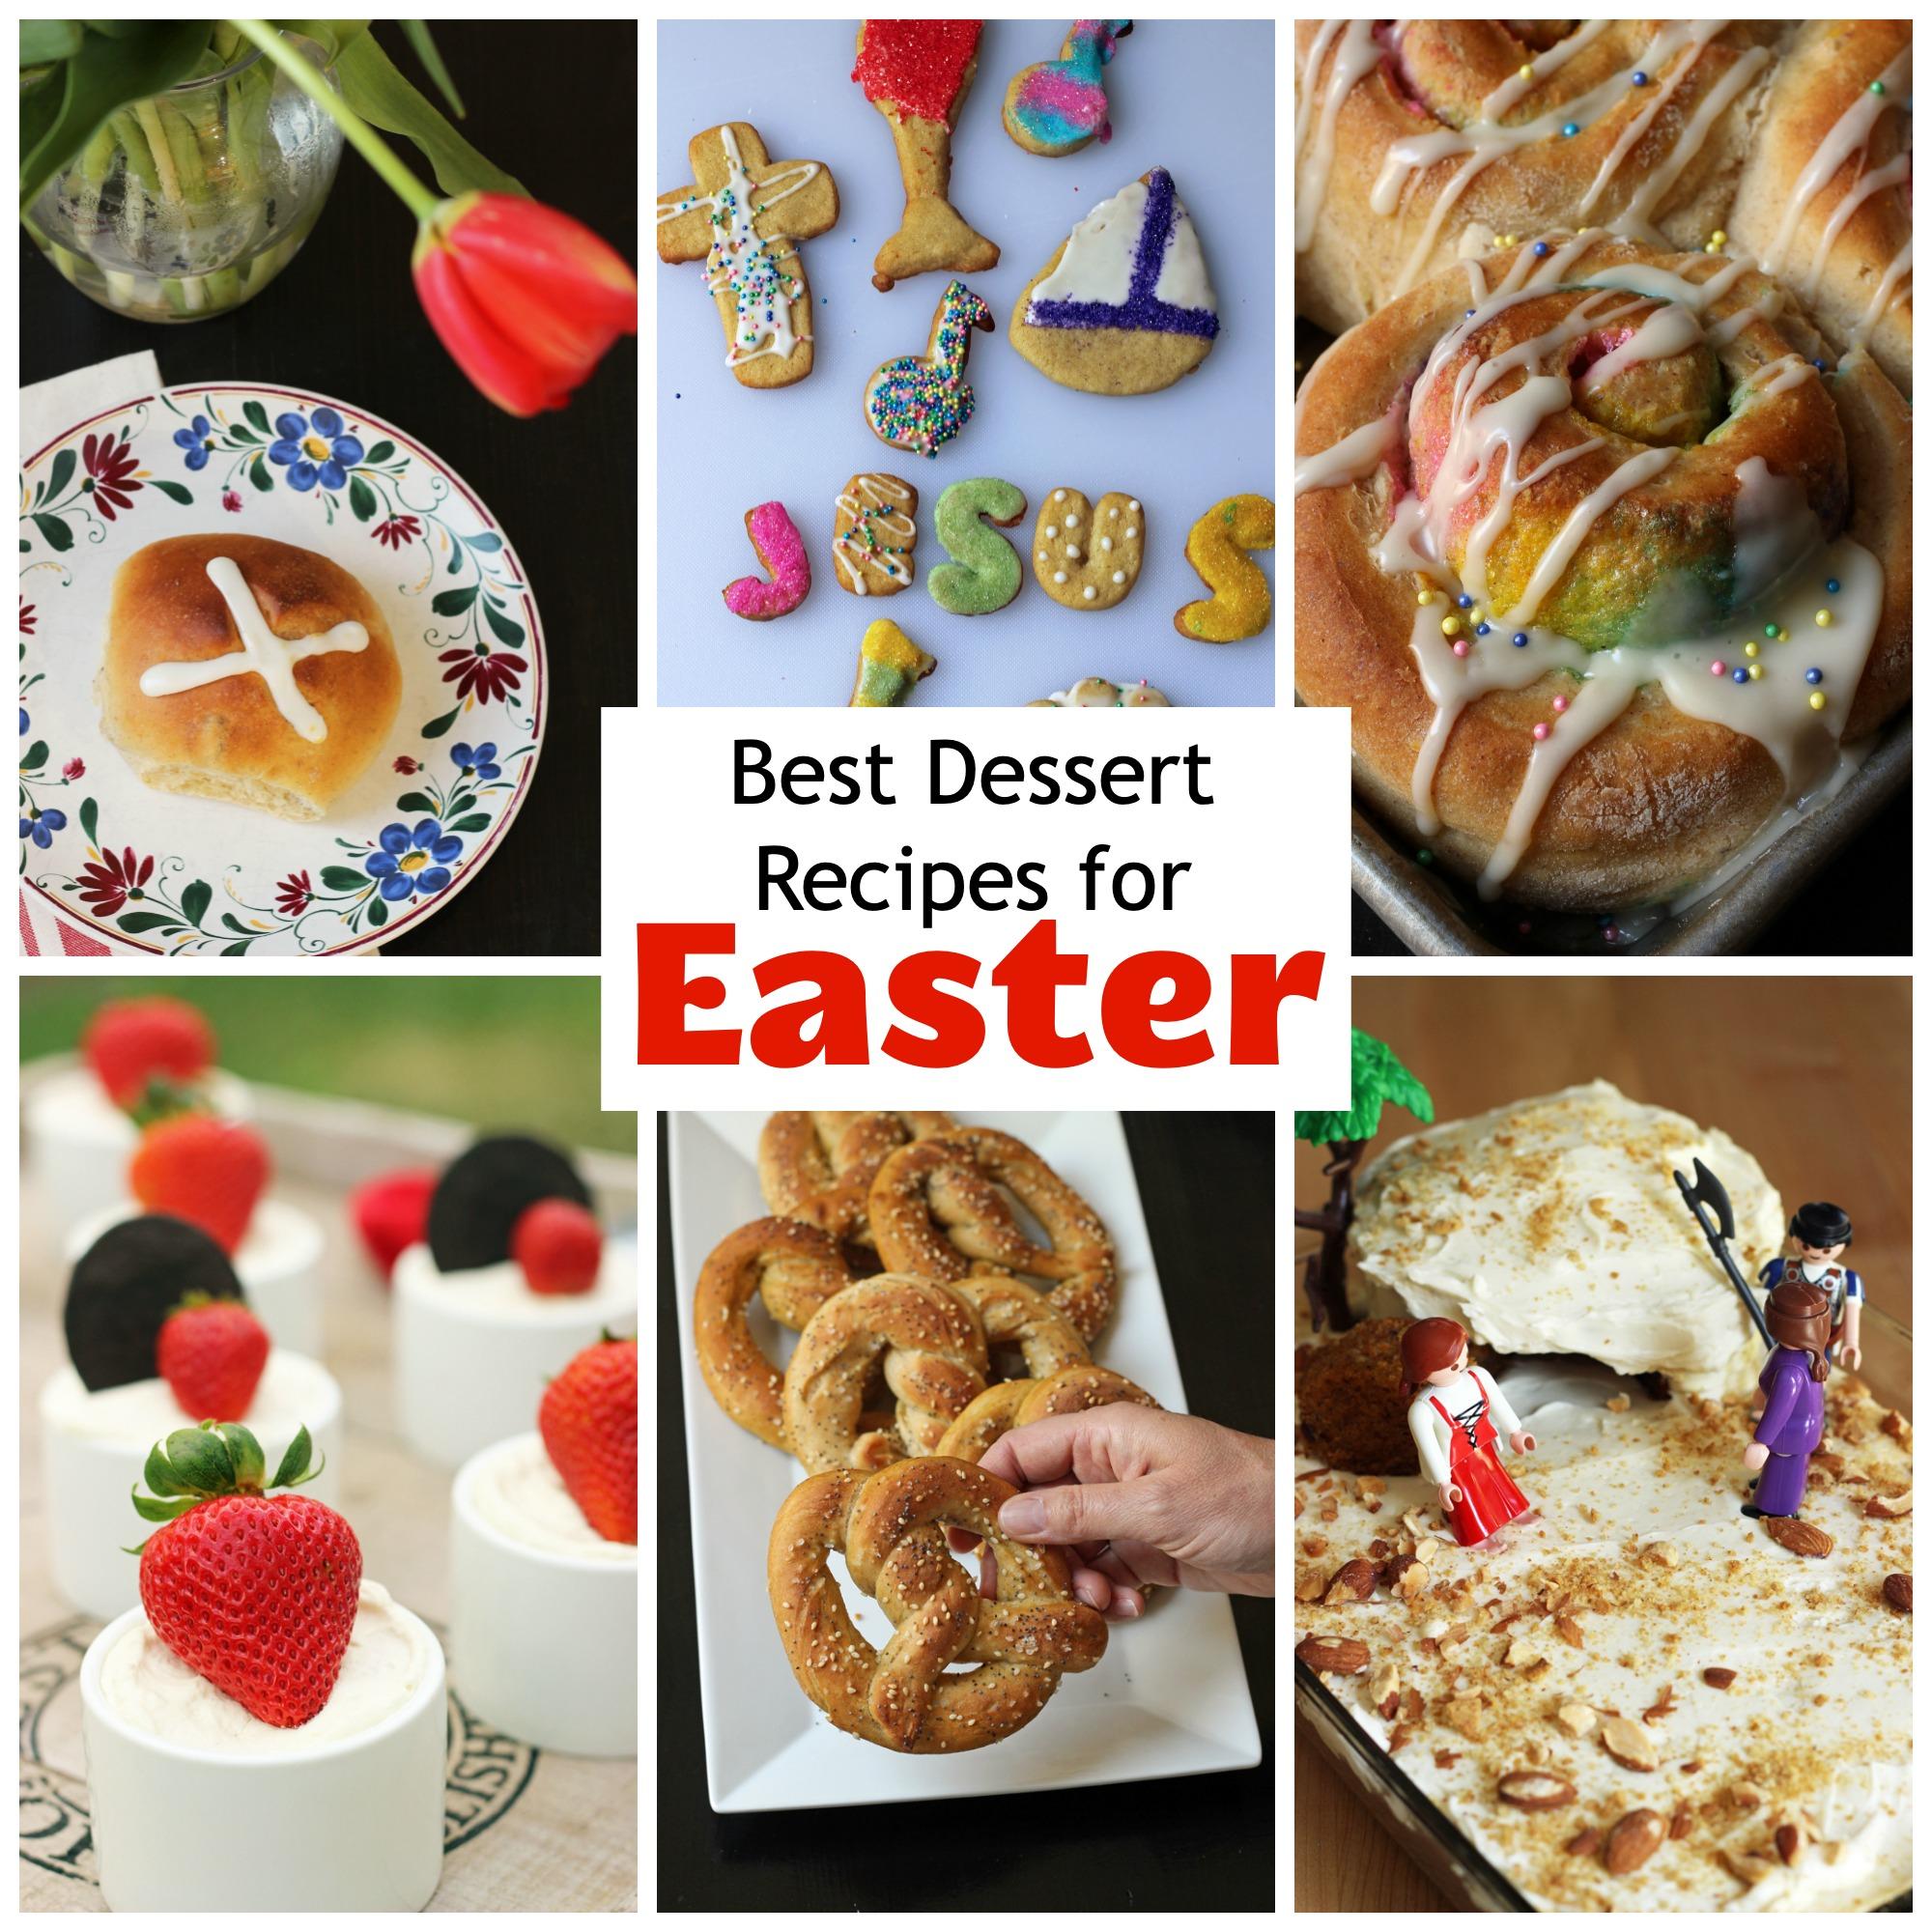 Best Dessert Recipes for Easter | Life as Mom